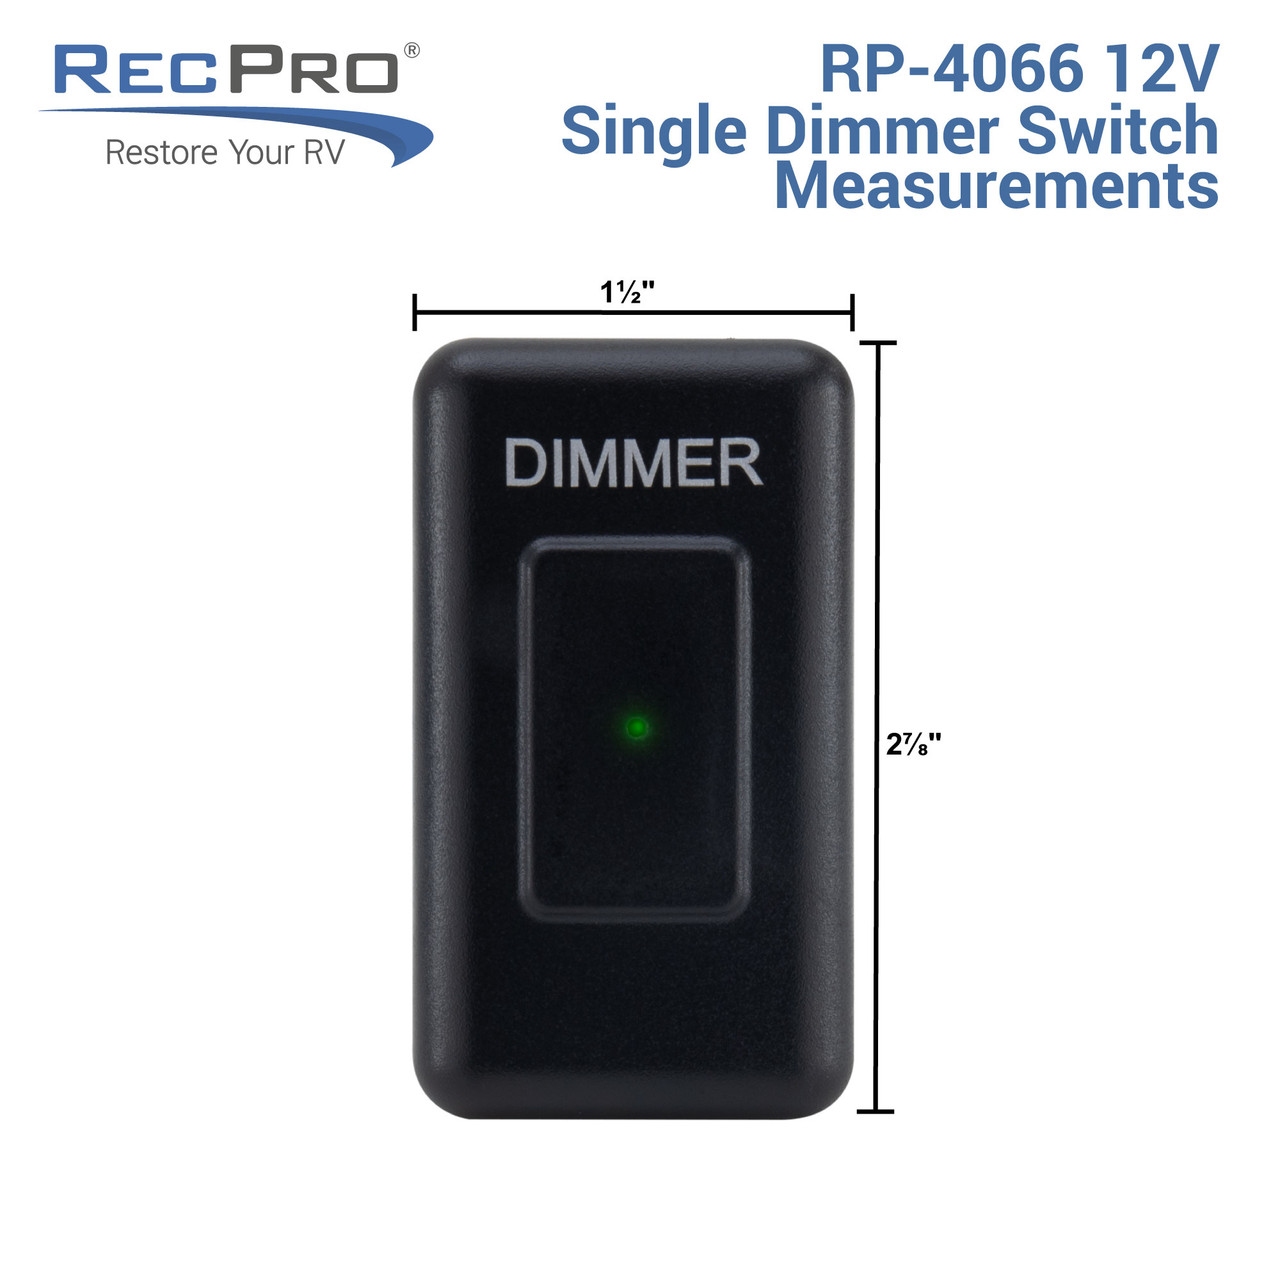 12v Dimmer Switch >> Rv 12v Dimmer Switch Touch Recpro